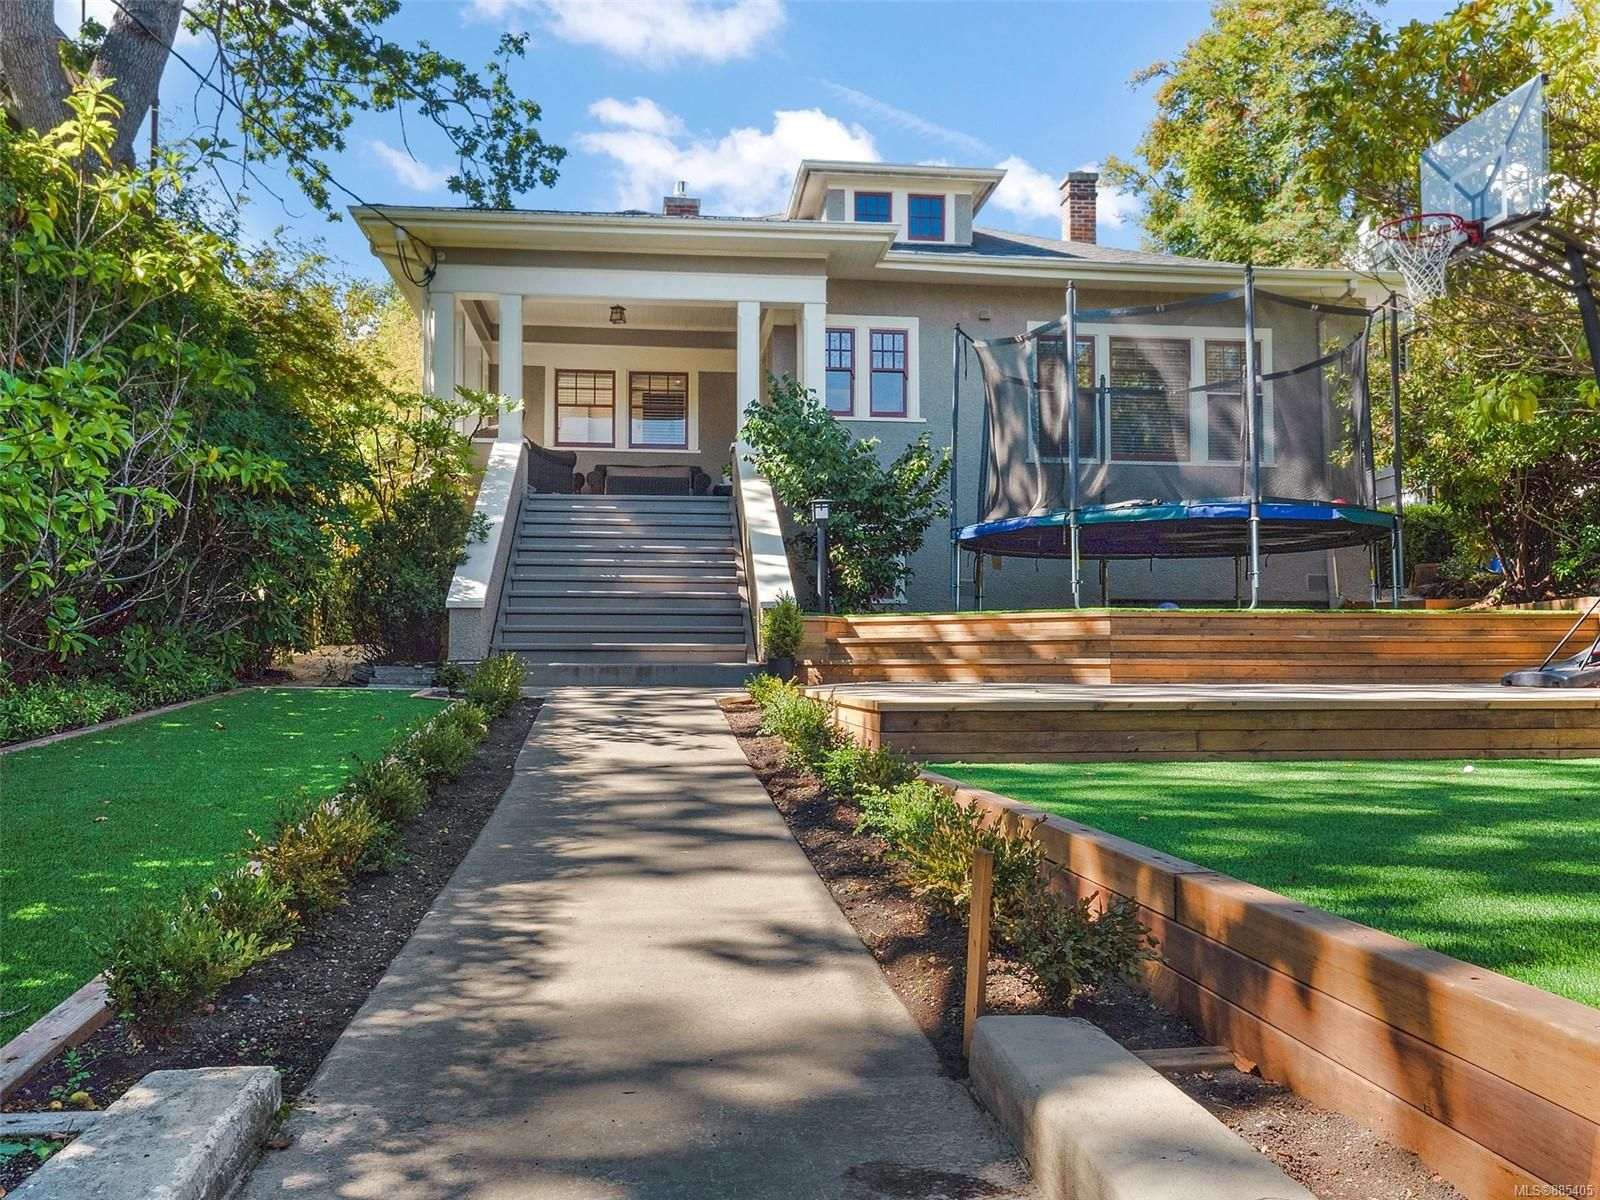 Main Photo: 1576 Hampshire Rd in : OB North Oak Bay House for sale (Oak Bay)  : MLS®# 885405